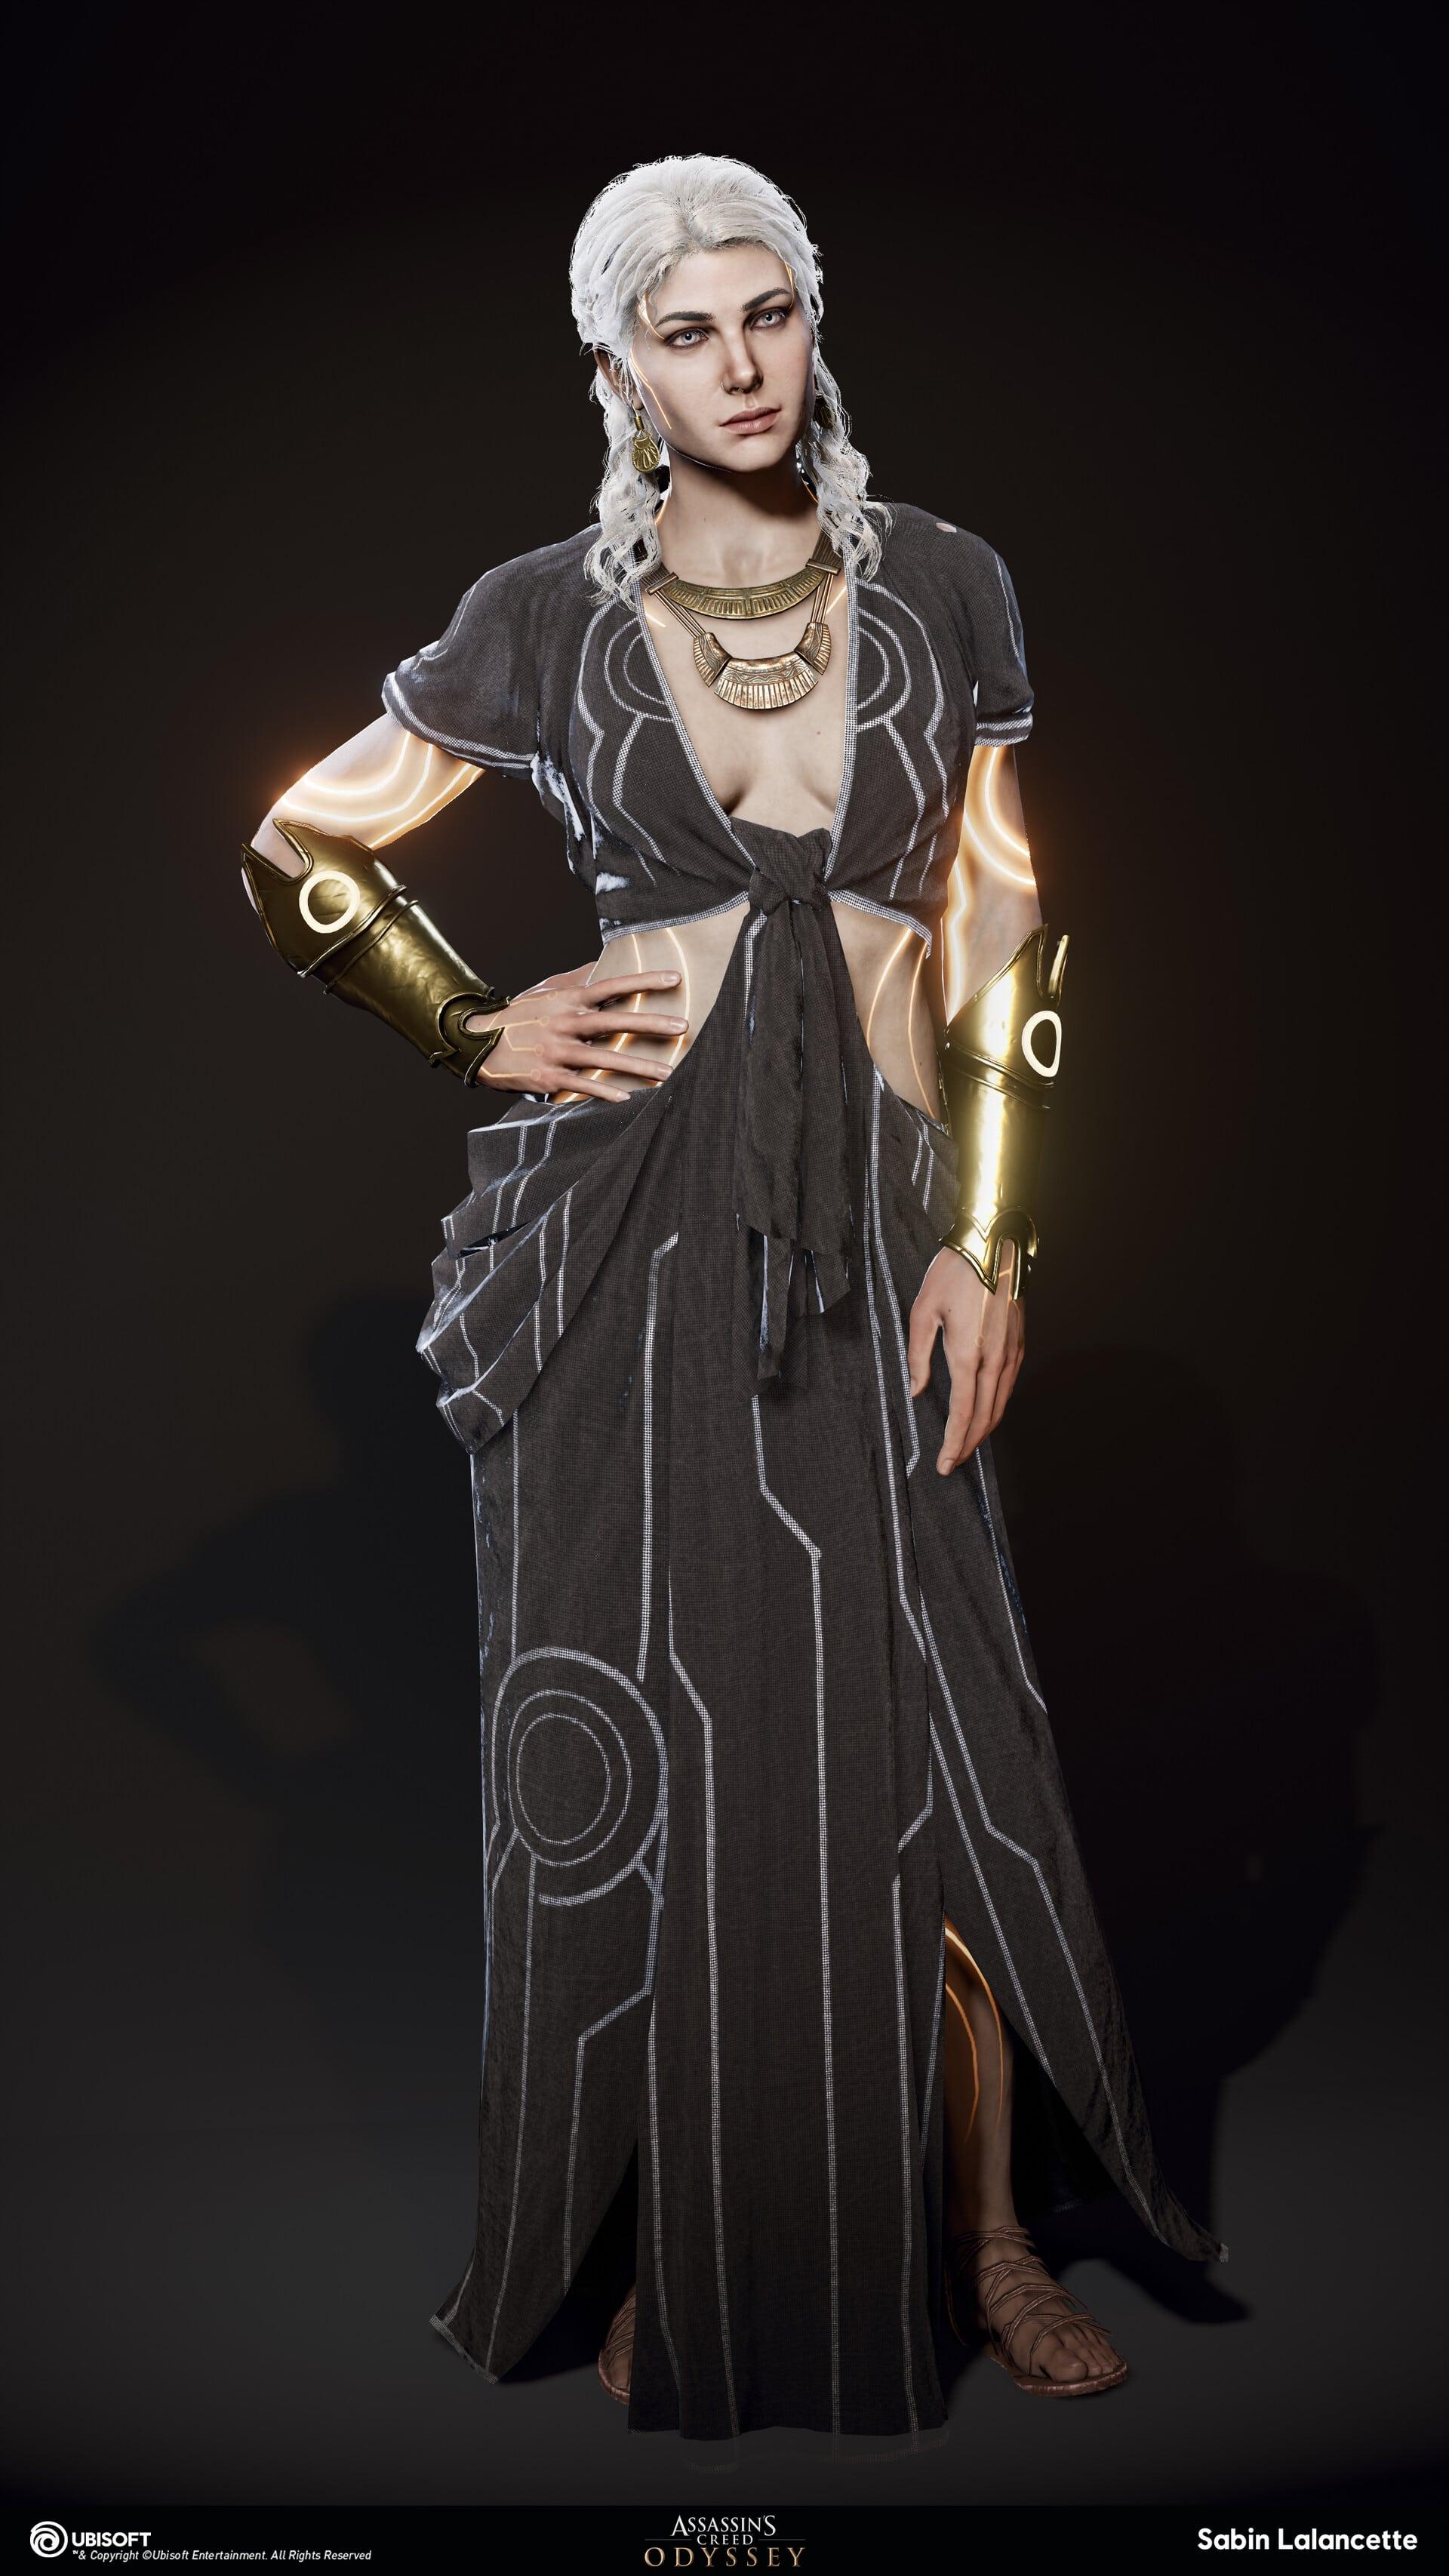 sabin-lalancette-artblast-fullsize-bodyfront-hekate-slalancette